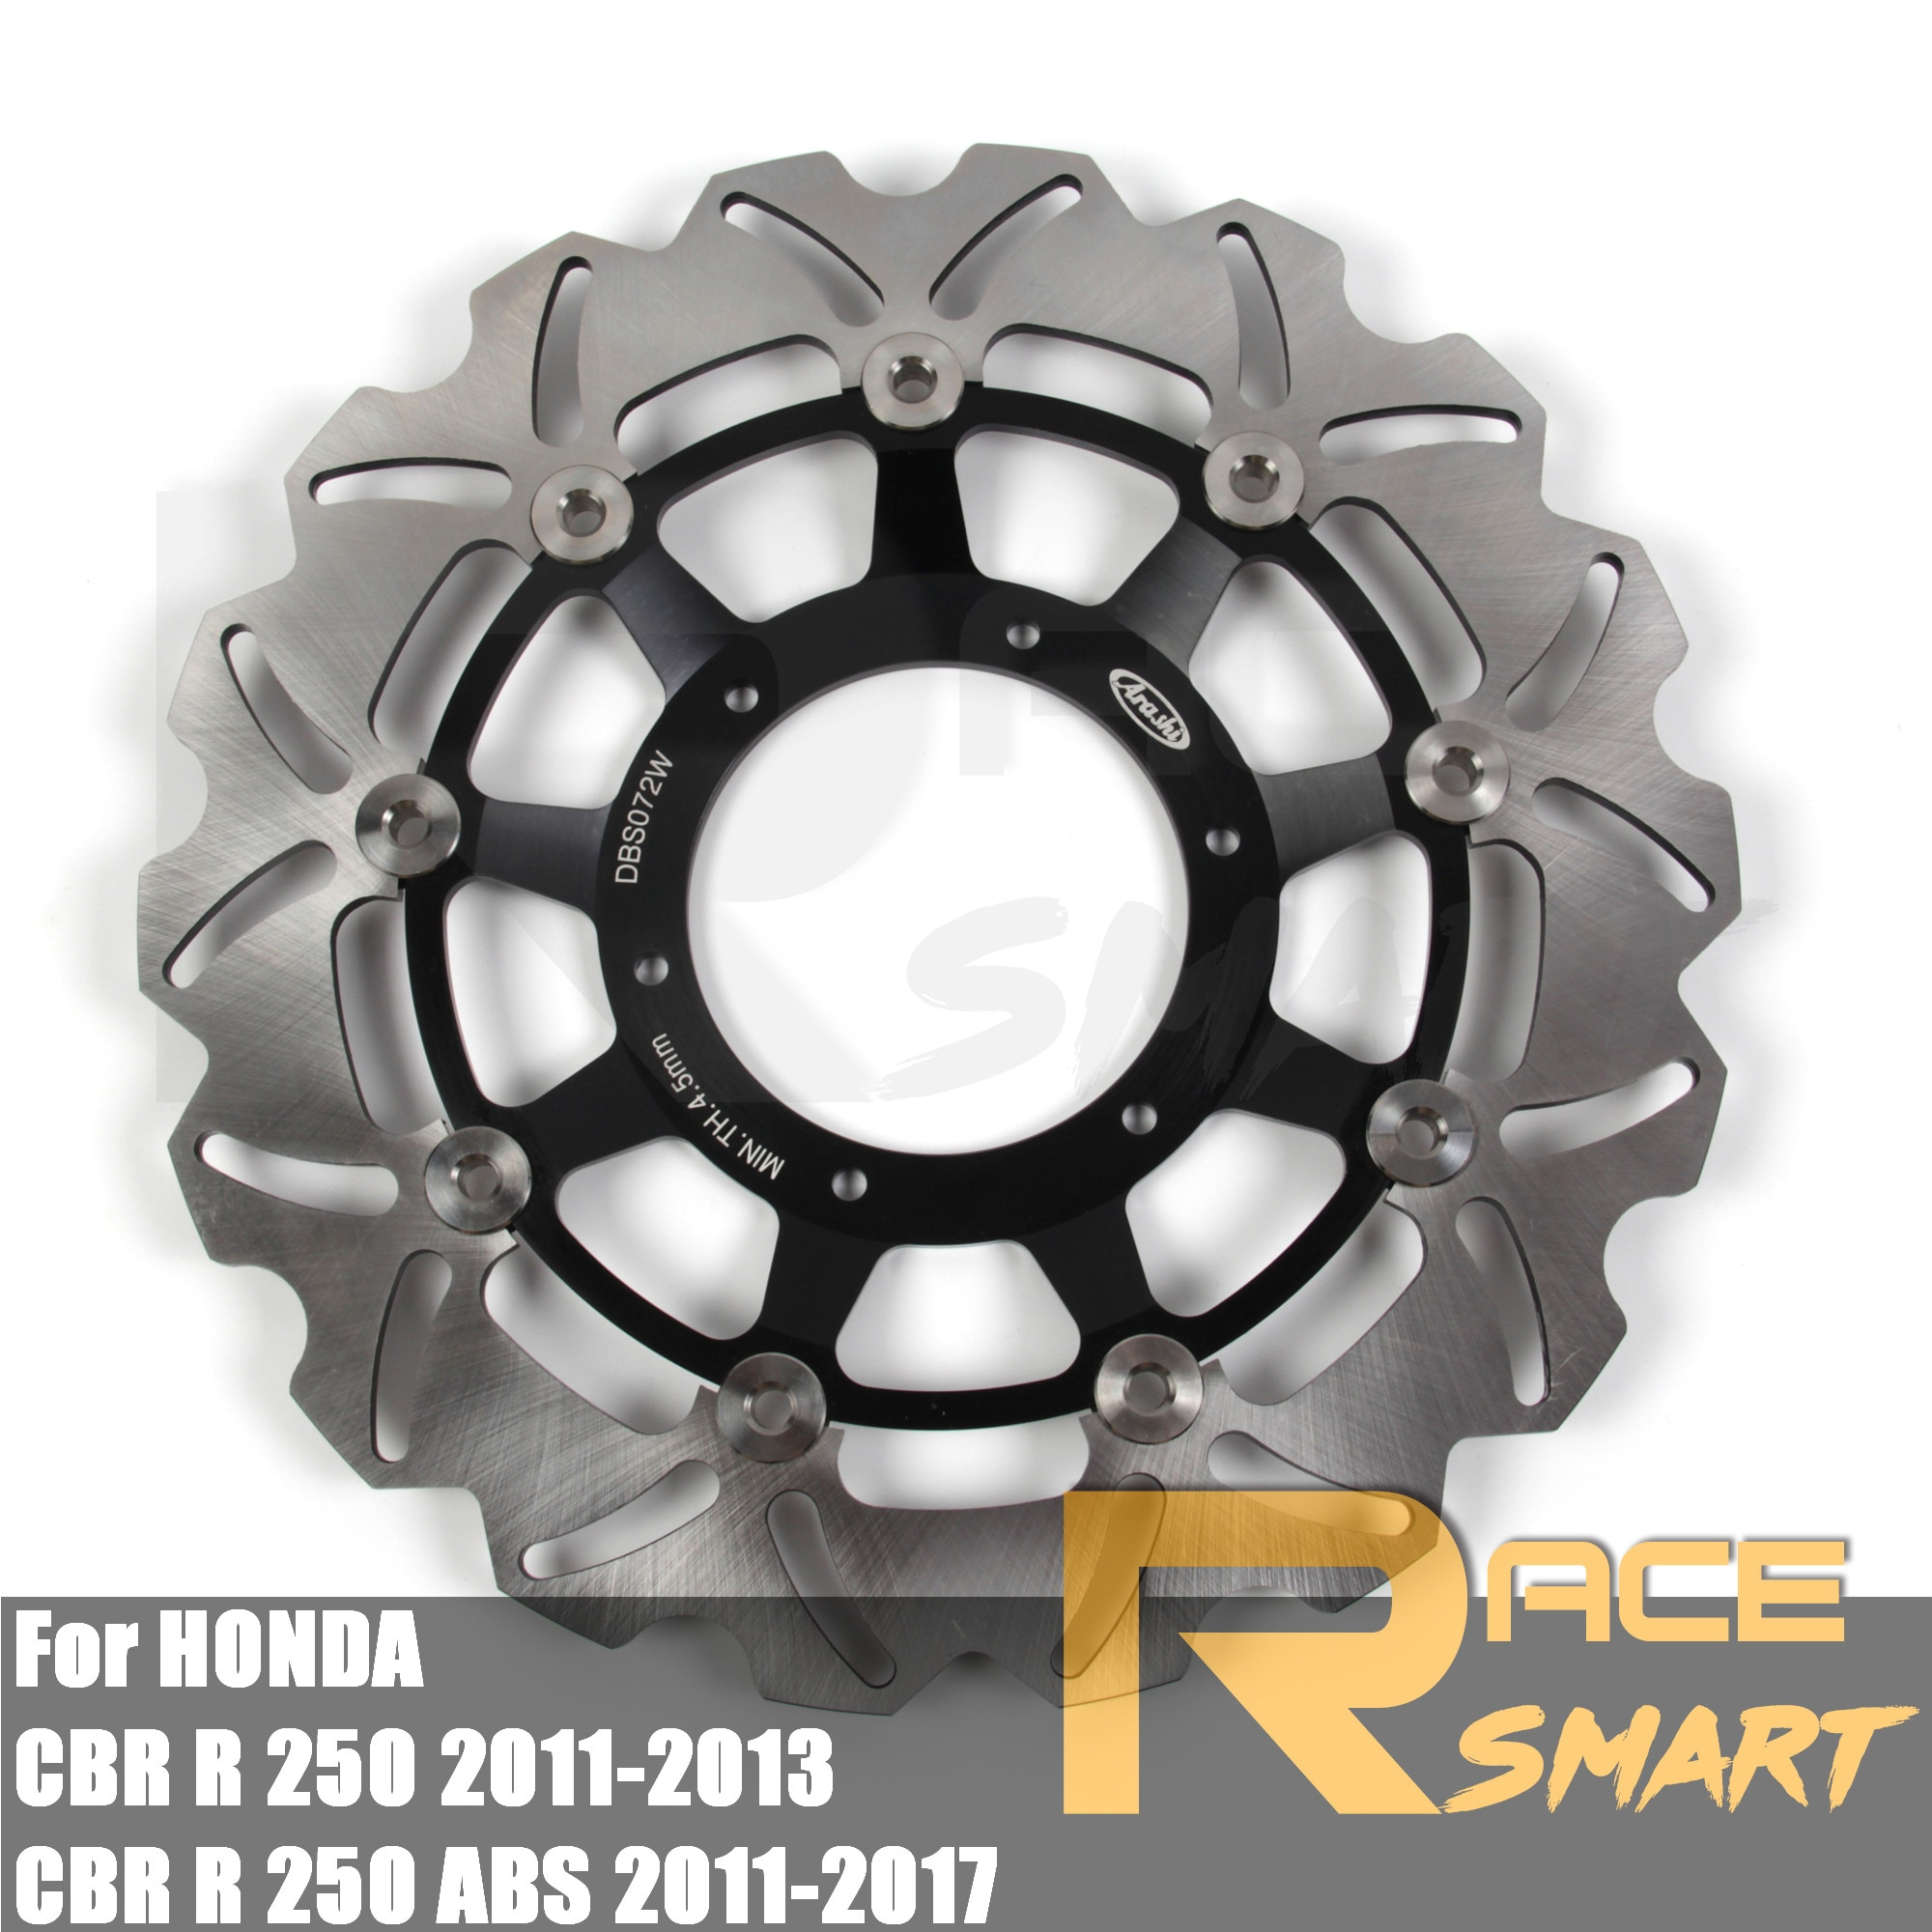 Para HONDA CBR R 250 ABS 2011-2017 2012 2014 2015 2016 motocicleta CNC freno delantero RotorBrake discos rotores CBR250R 2011-2013